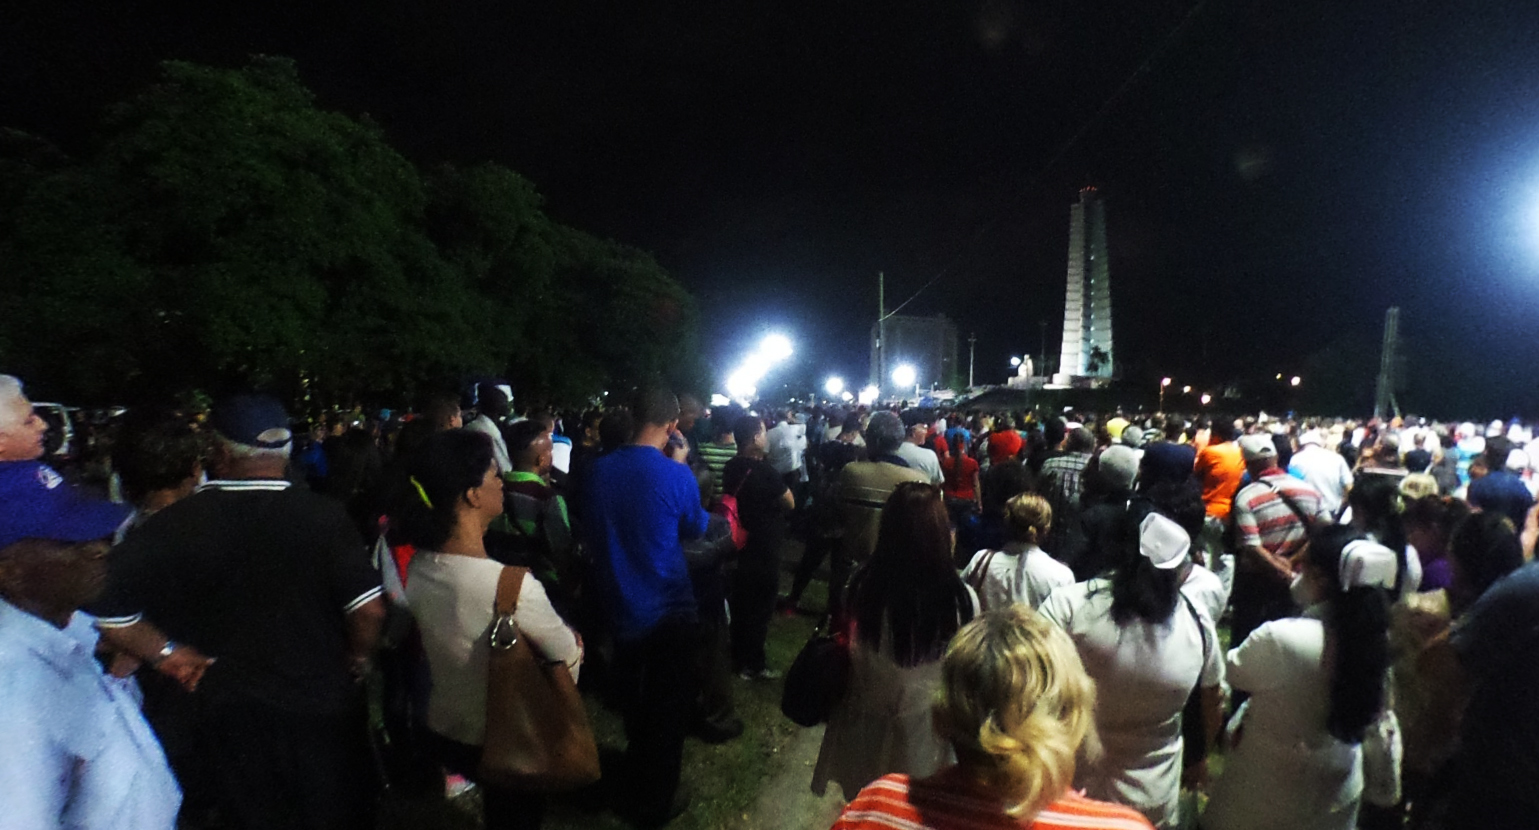 plaza-revolucion-la-habana-cuba-homenaje-fidel-castro-fer-360-grados